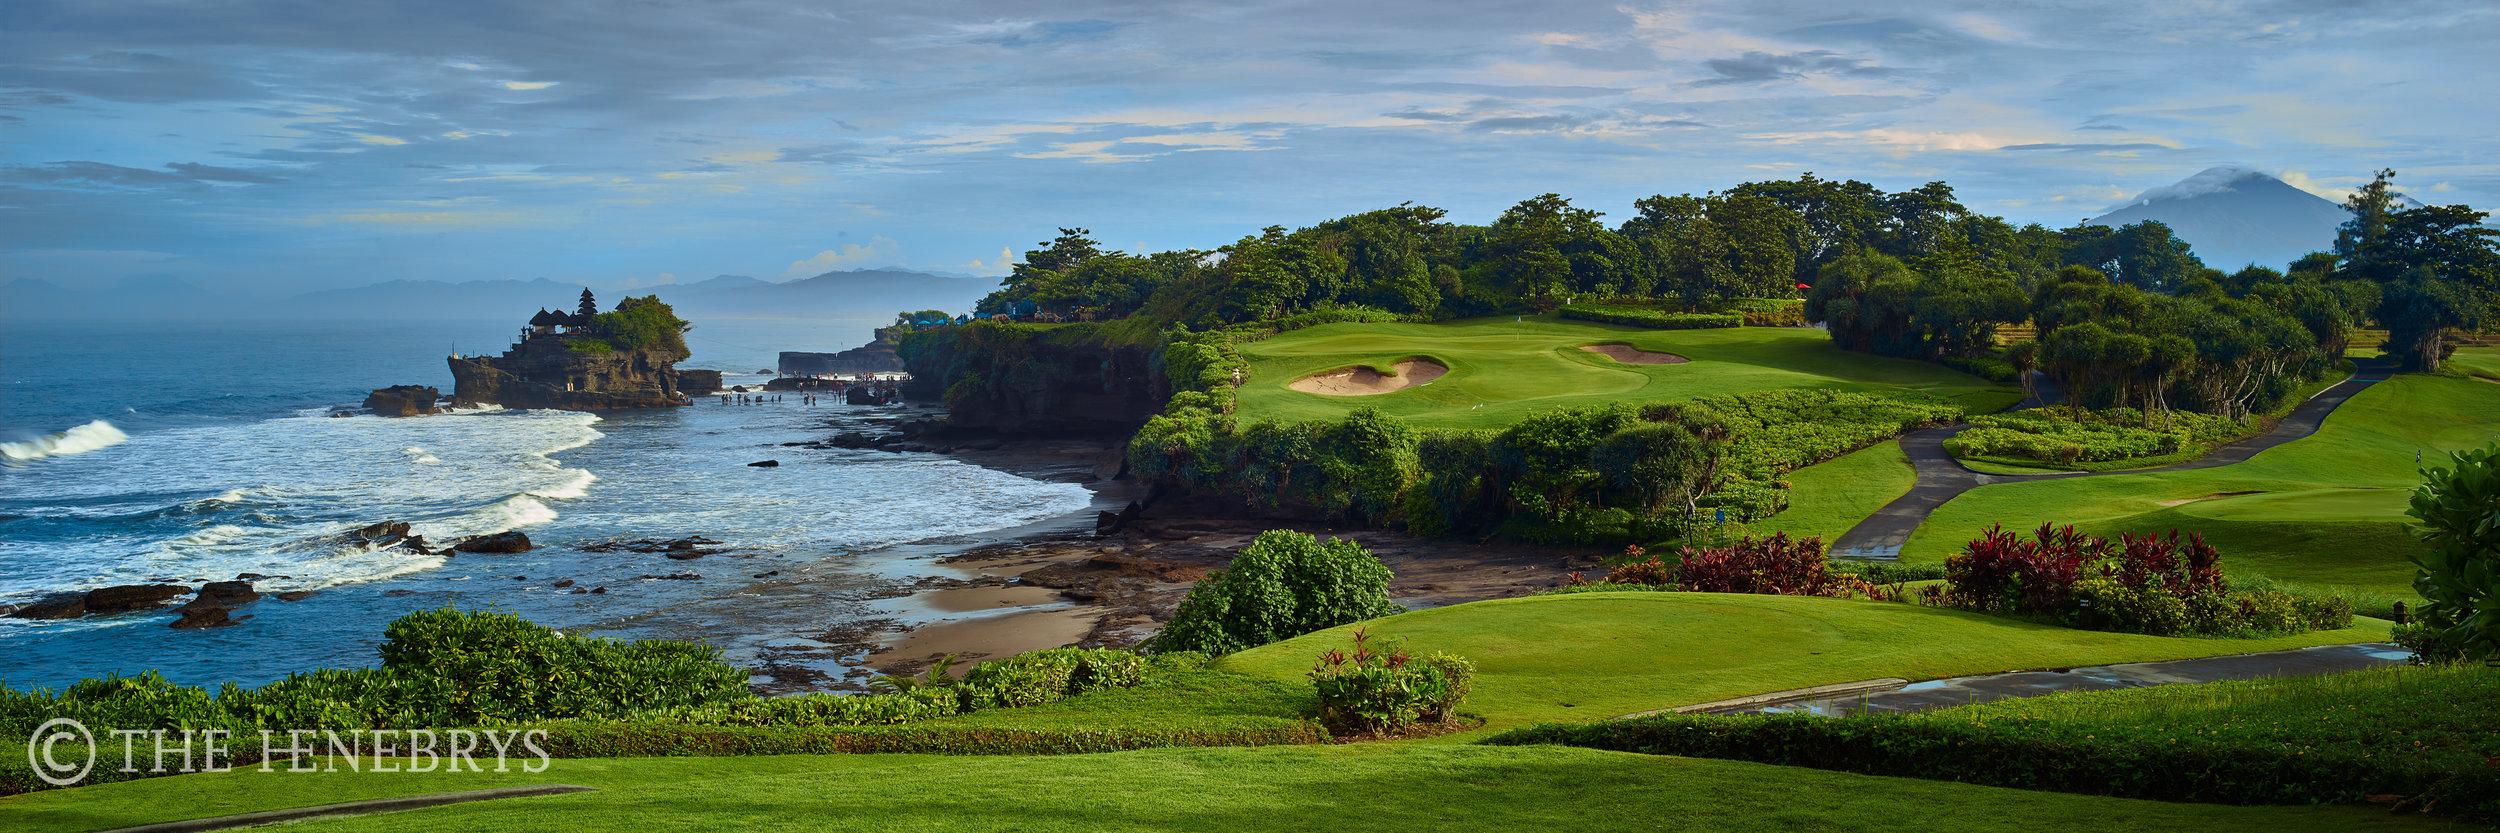 7th Nirwana Bali Golf Club, Indonesia